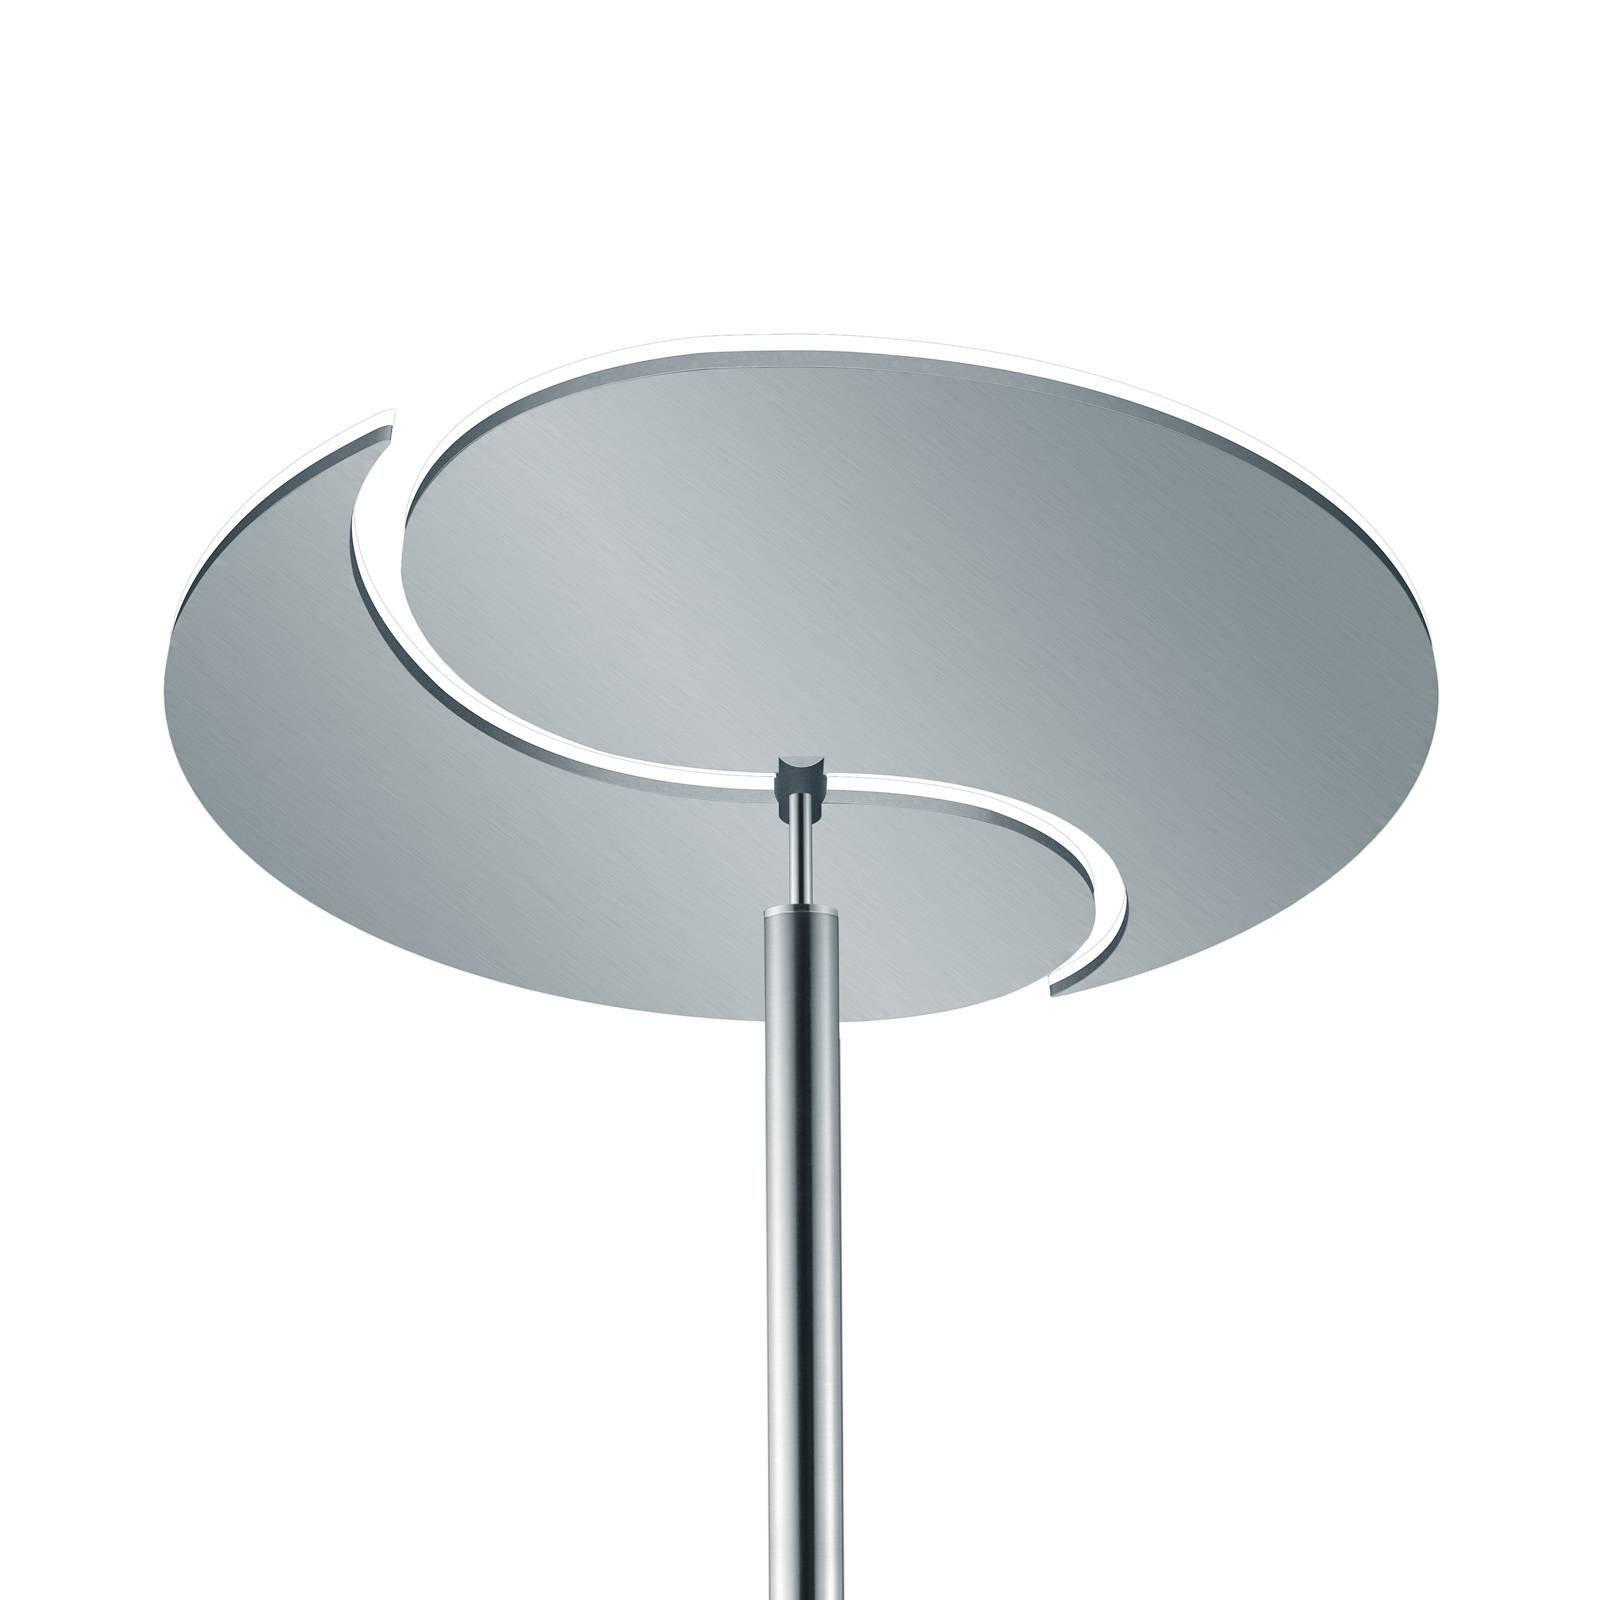 B-Leuchten Malibu LED-gulvlampe, matt nikkel CCT